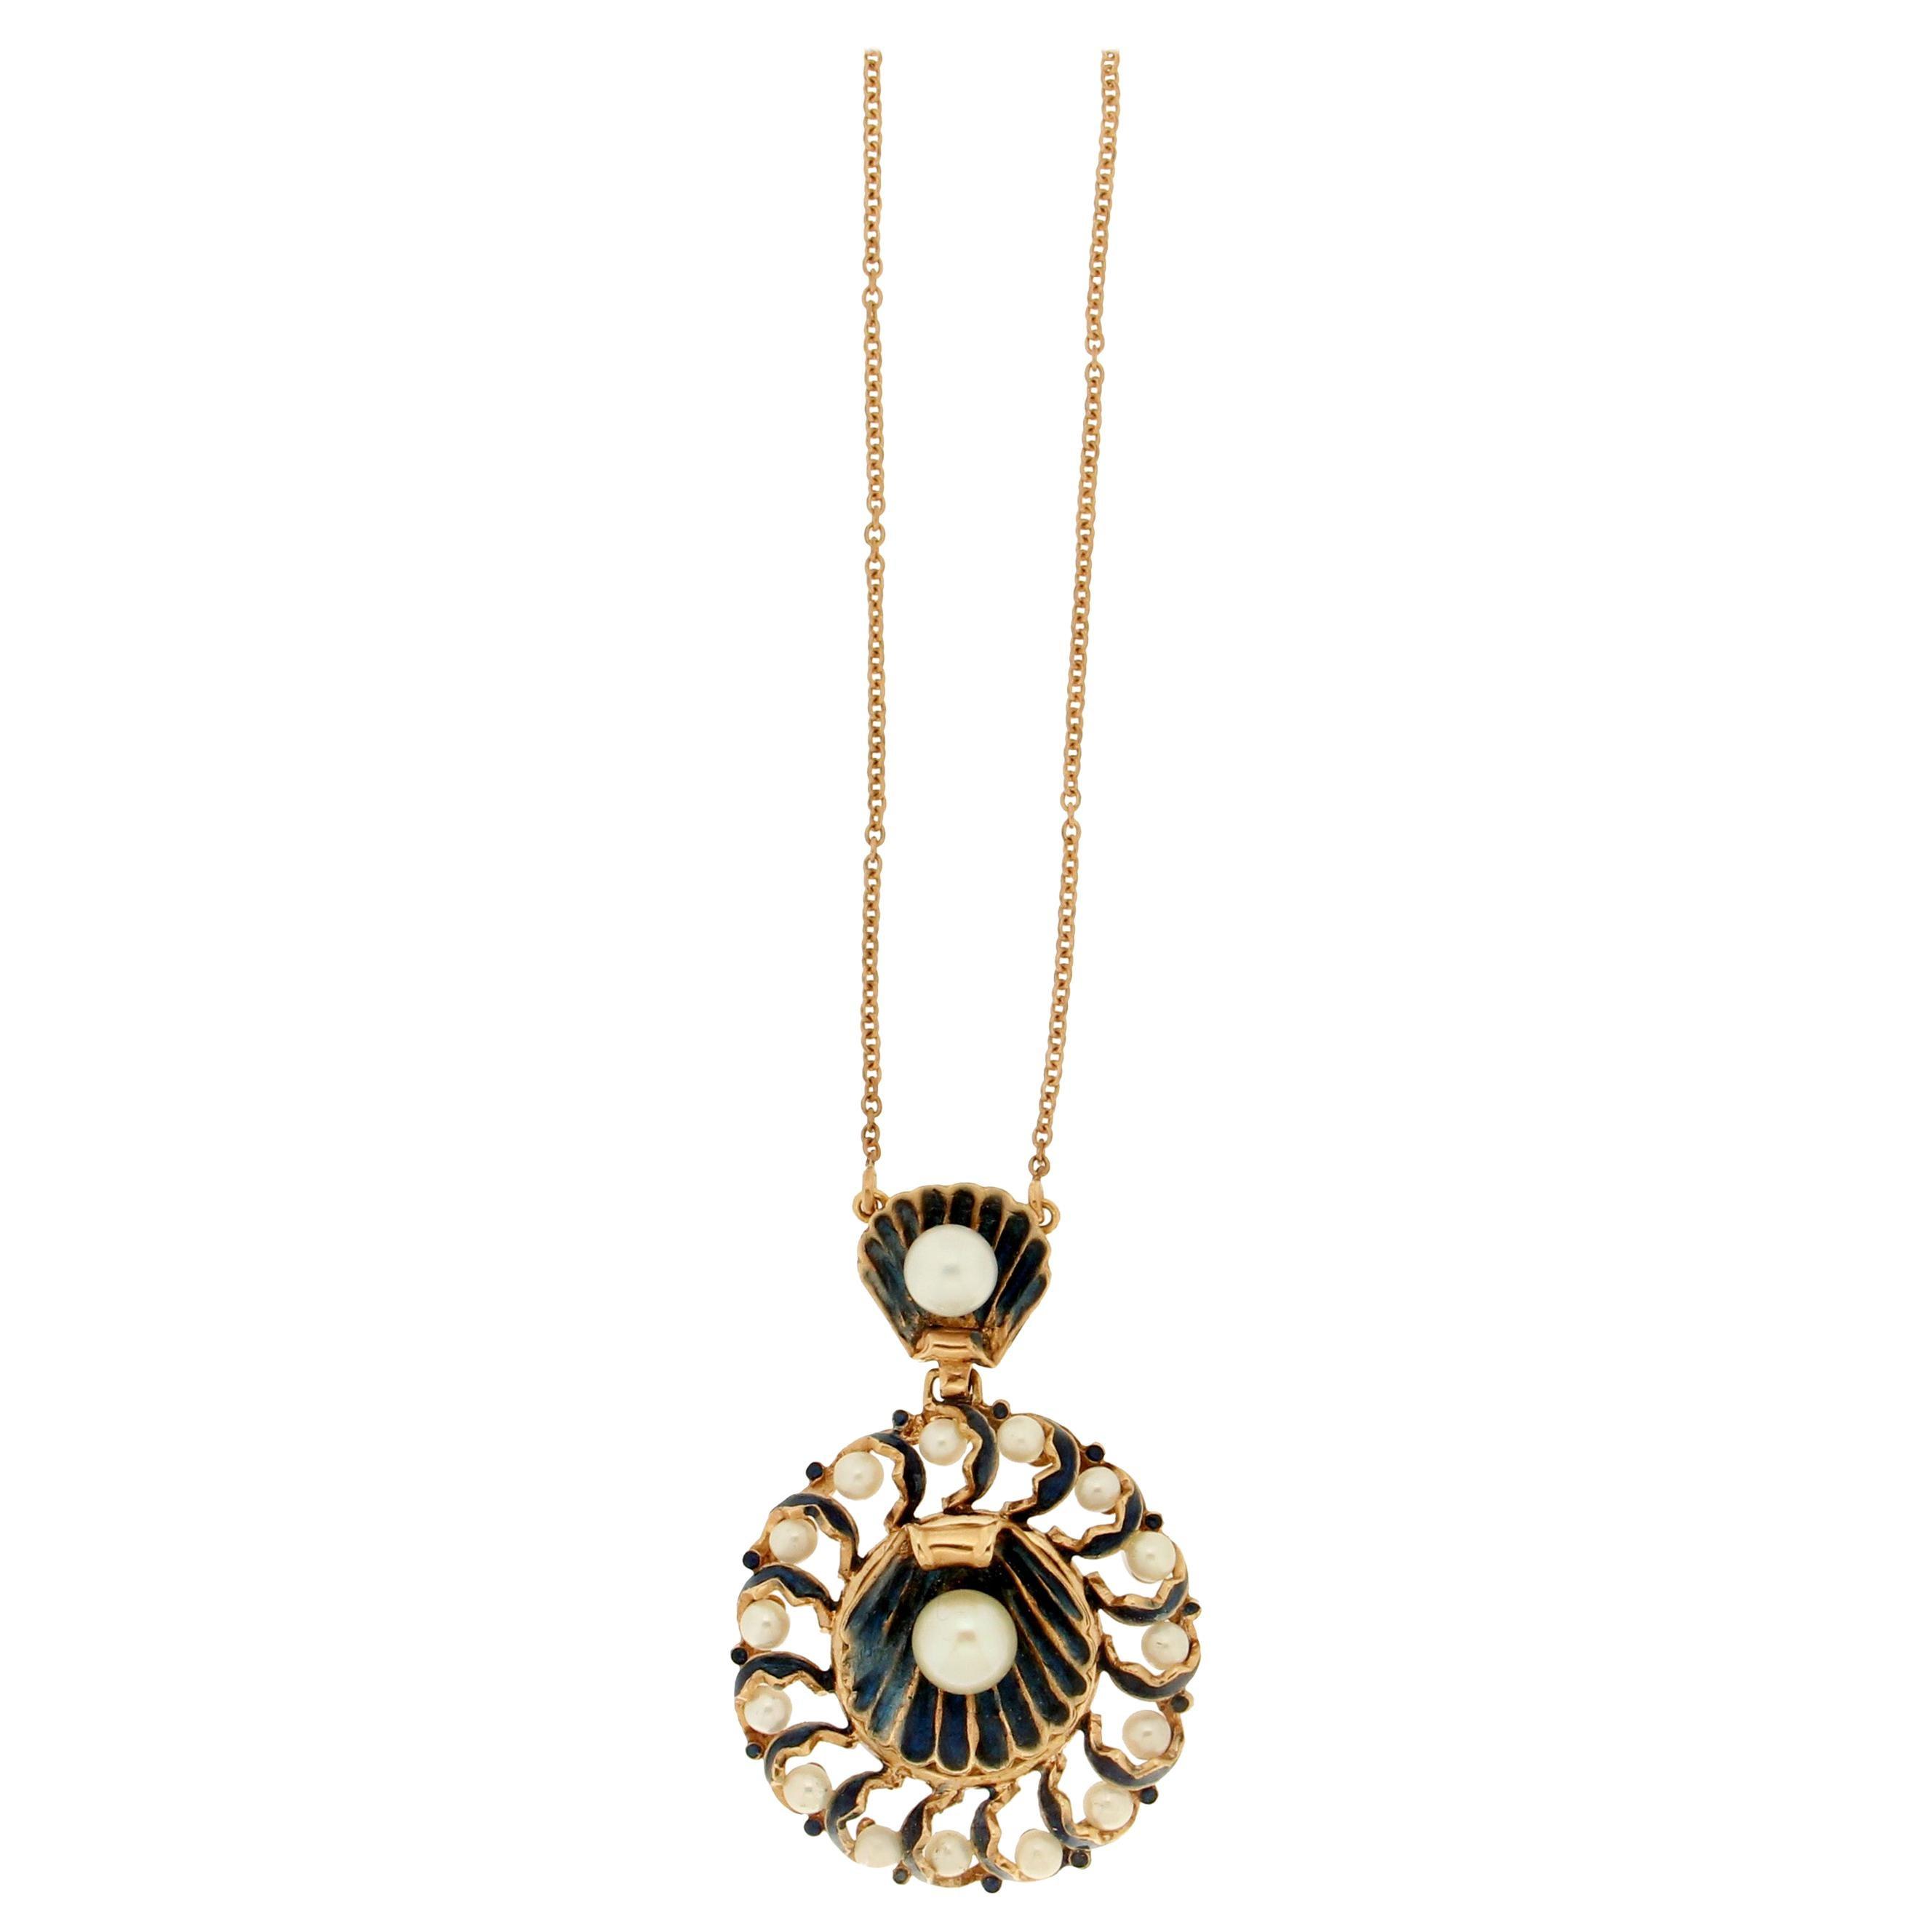 Handcraft Pearls 14 Karat Yellow Gold Pendant Necklace